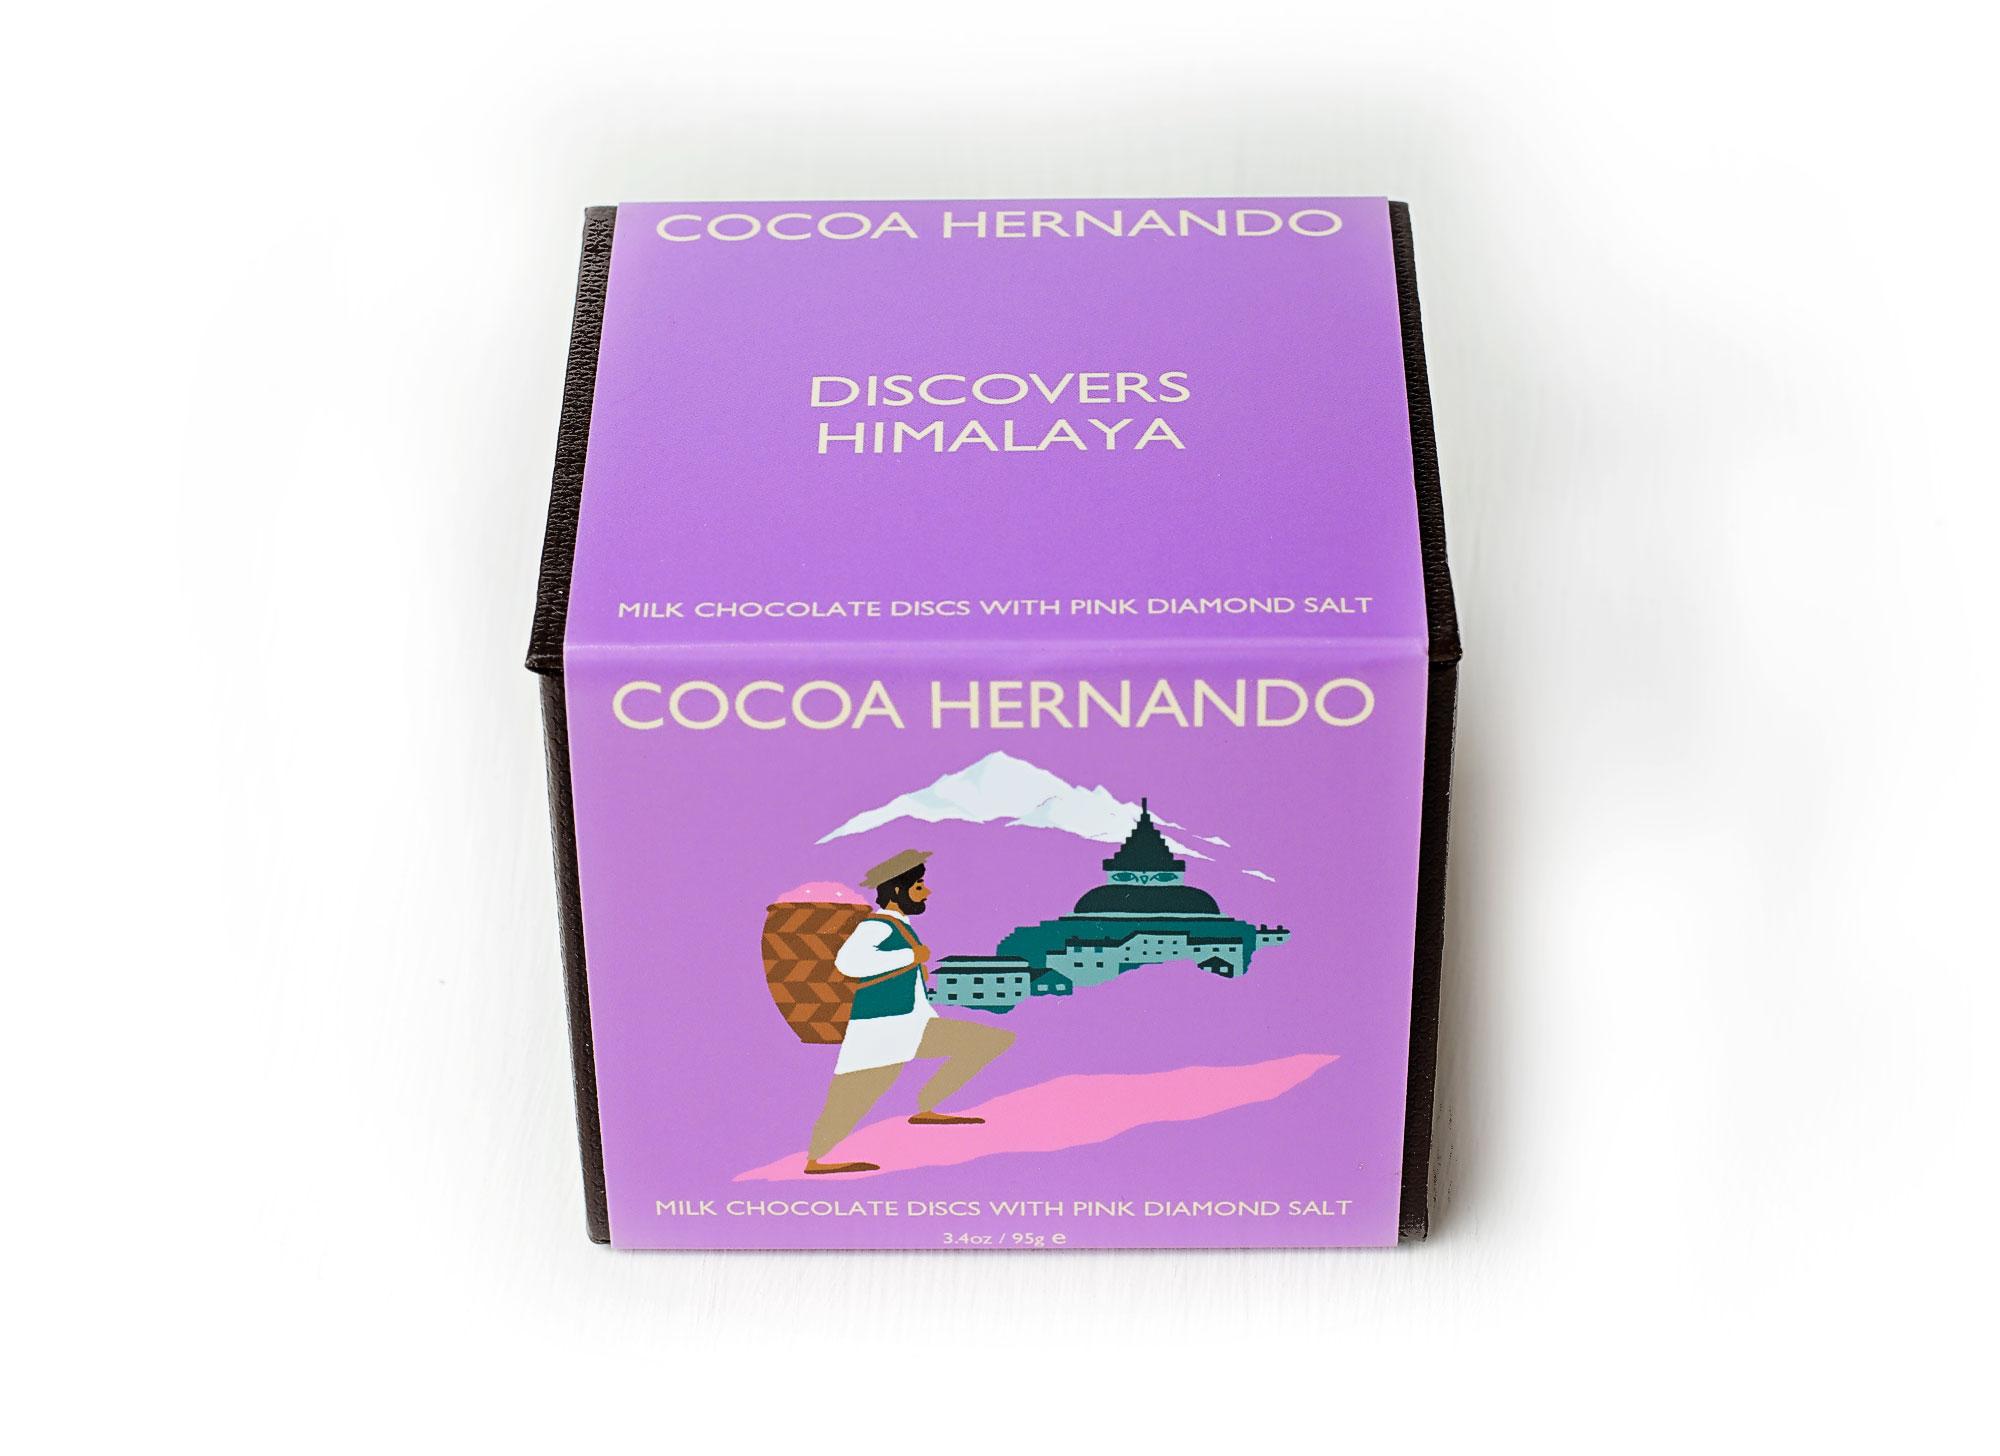 DiscoverHimalayas